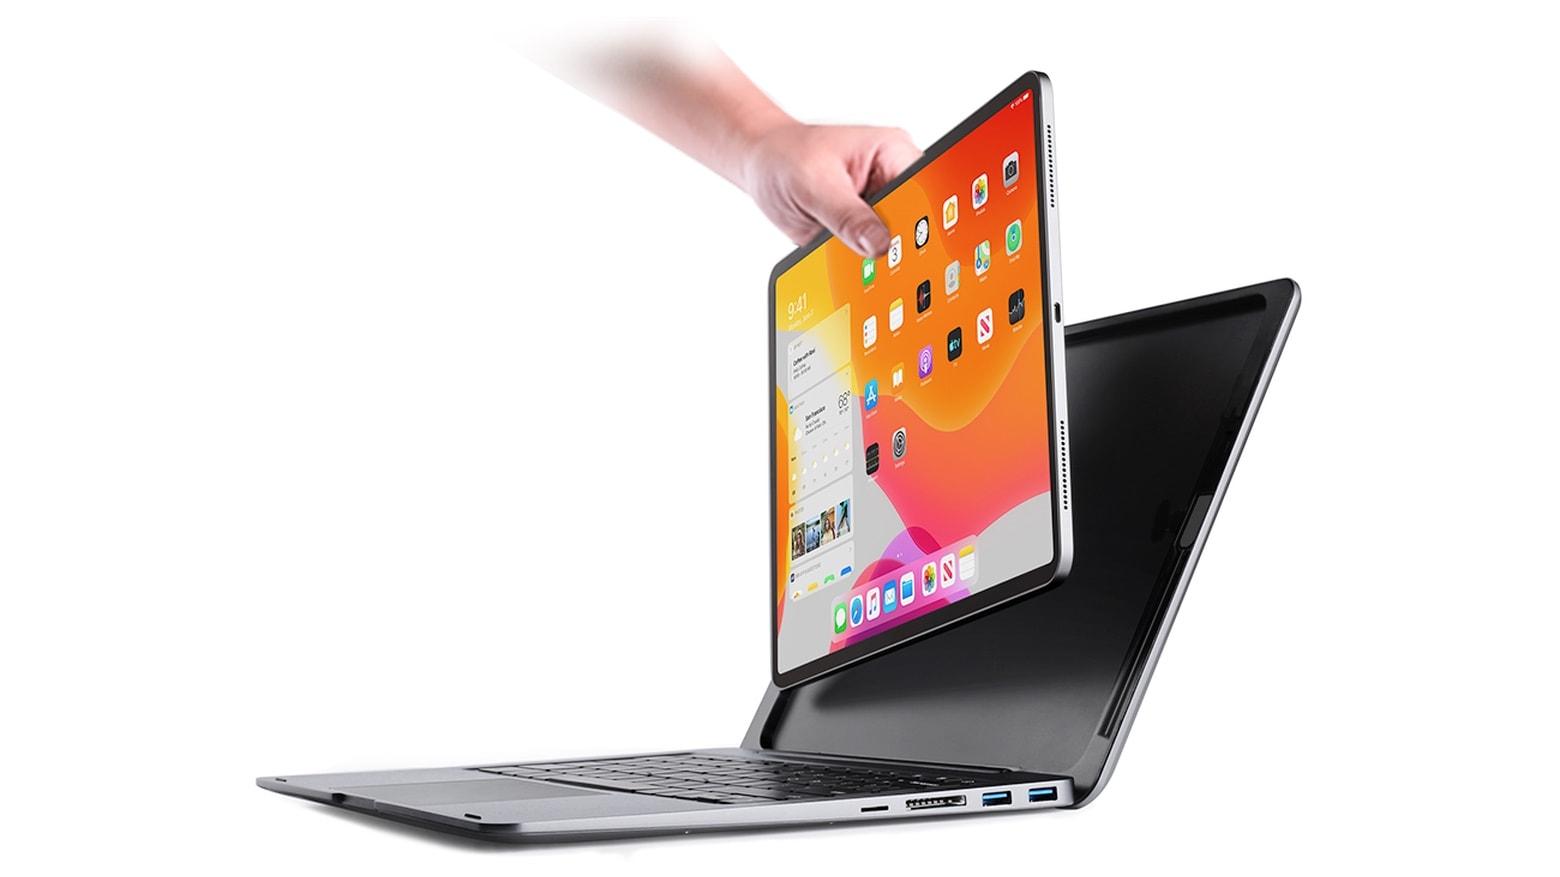 Doqo keyboard for the 12.9-inch iPad Pro.